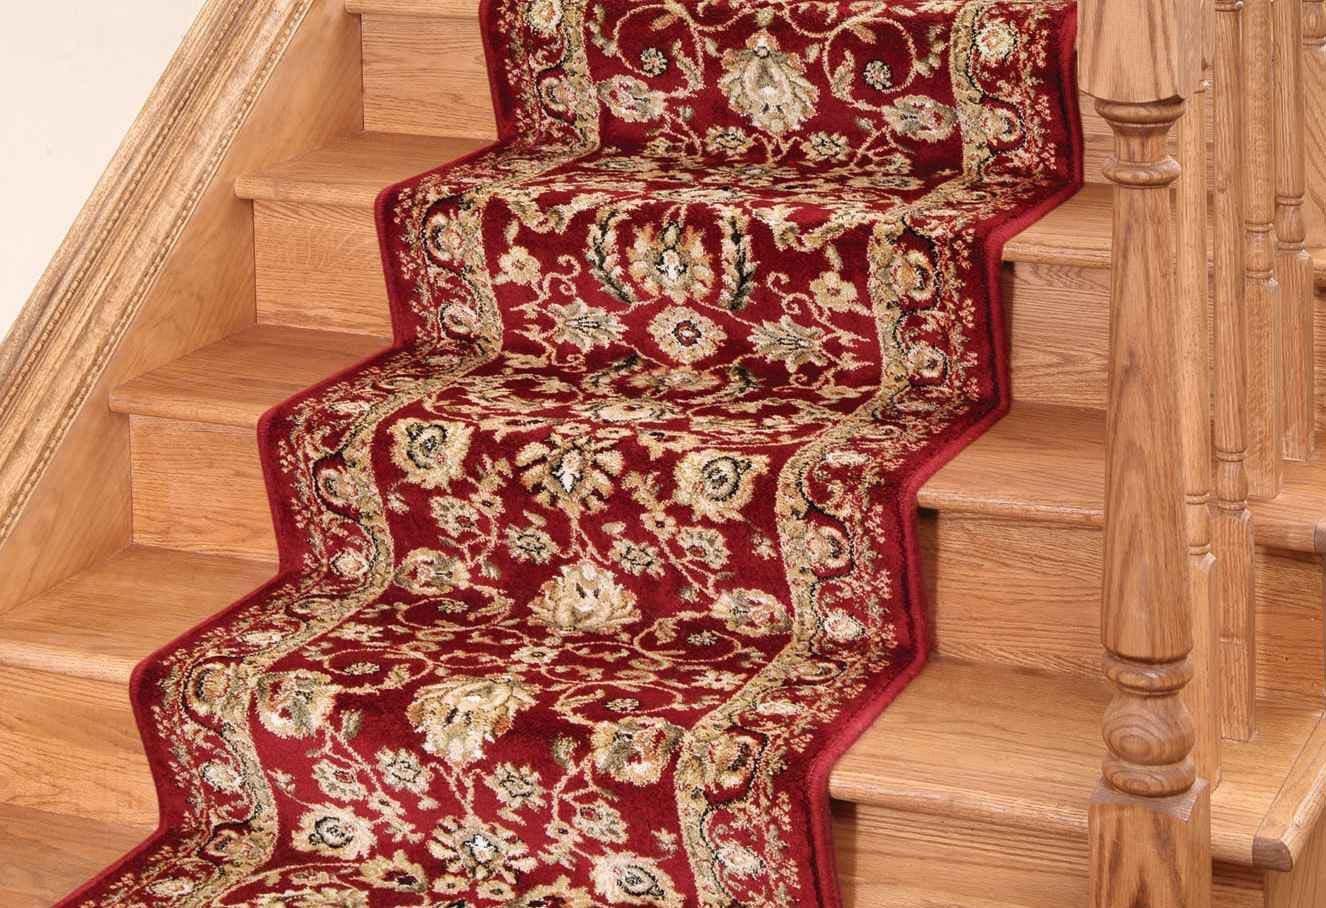 Oriental Carpet Stair Treads Carpet Stairs Stair Runner Carpet | Oriental Carpet Stair Treads | Non Skid | Kings Court | Carpet Runners | Amazon | Stair Runner